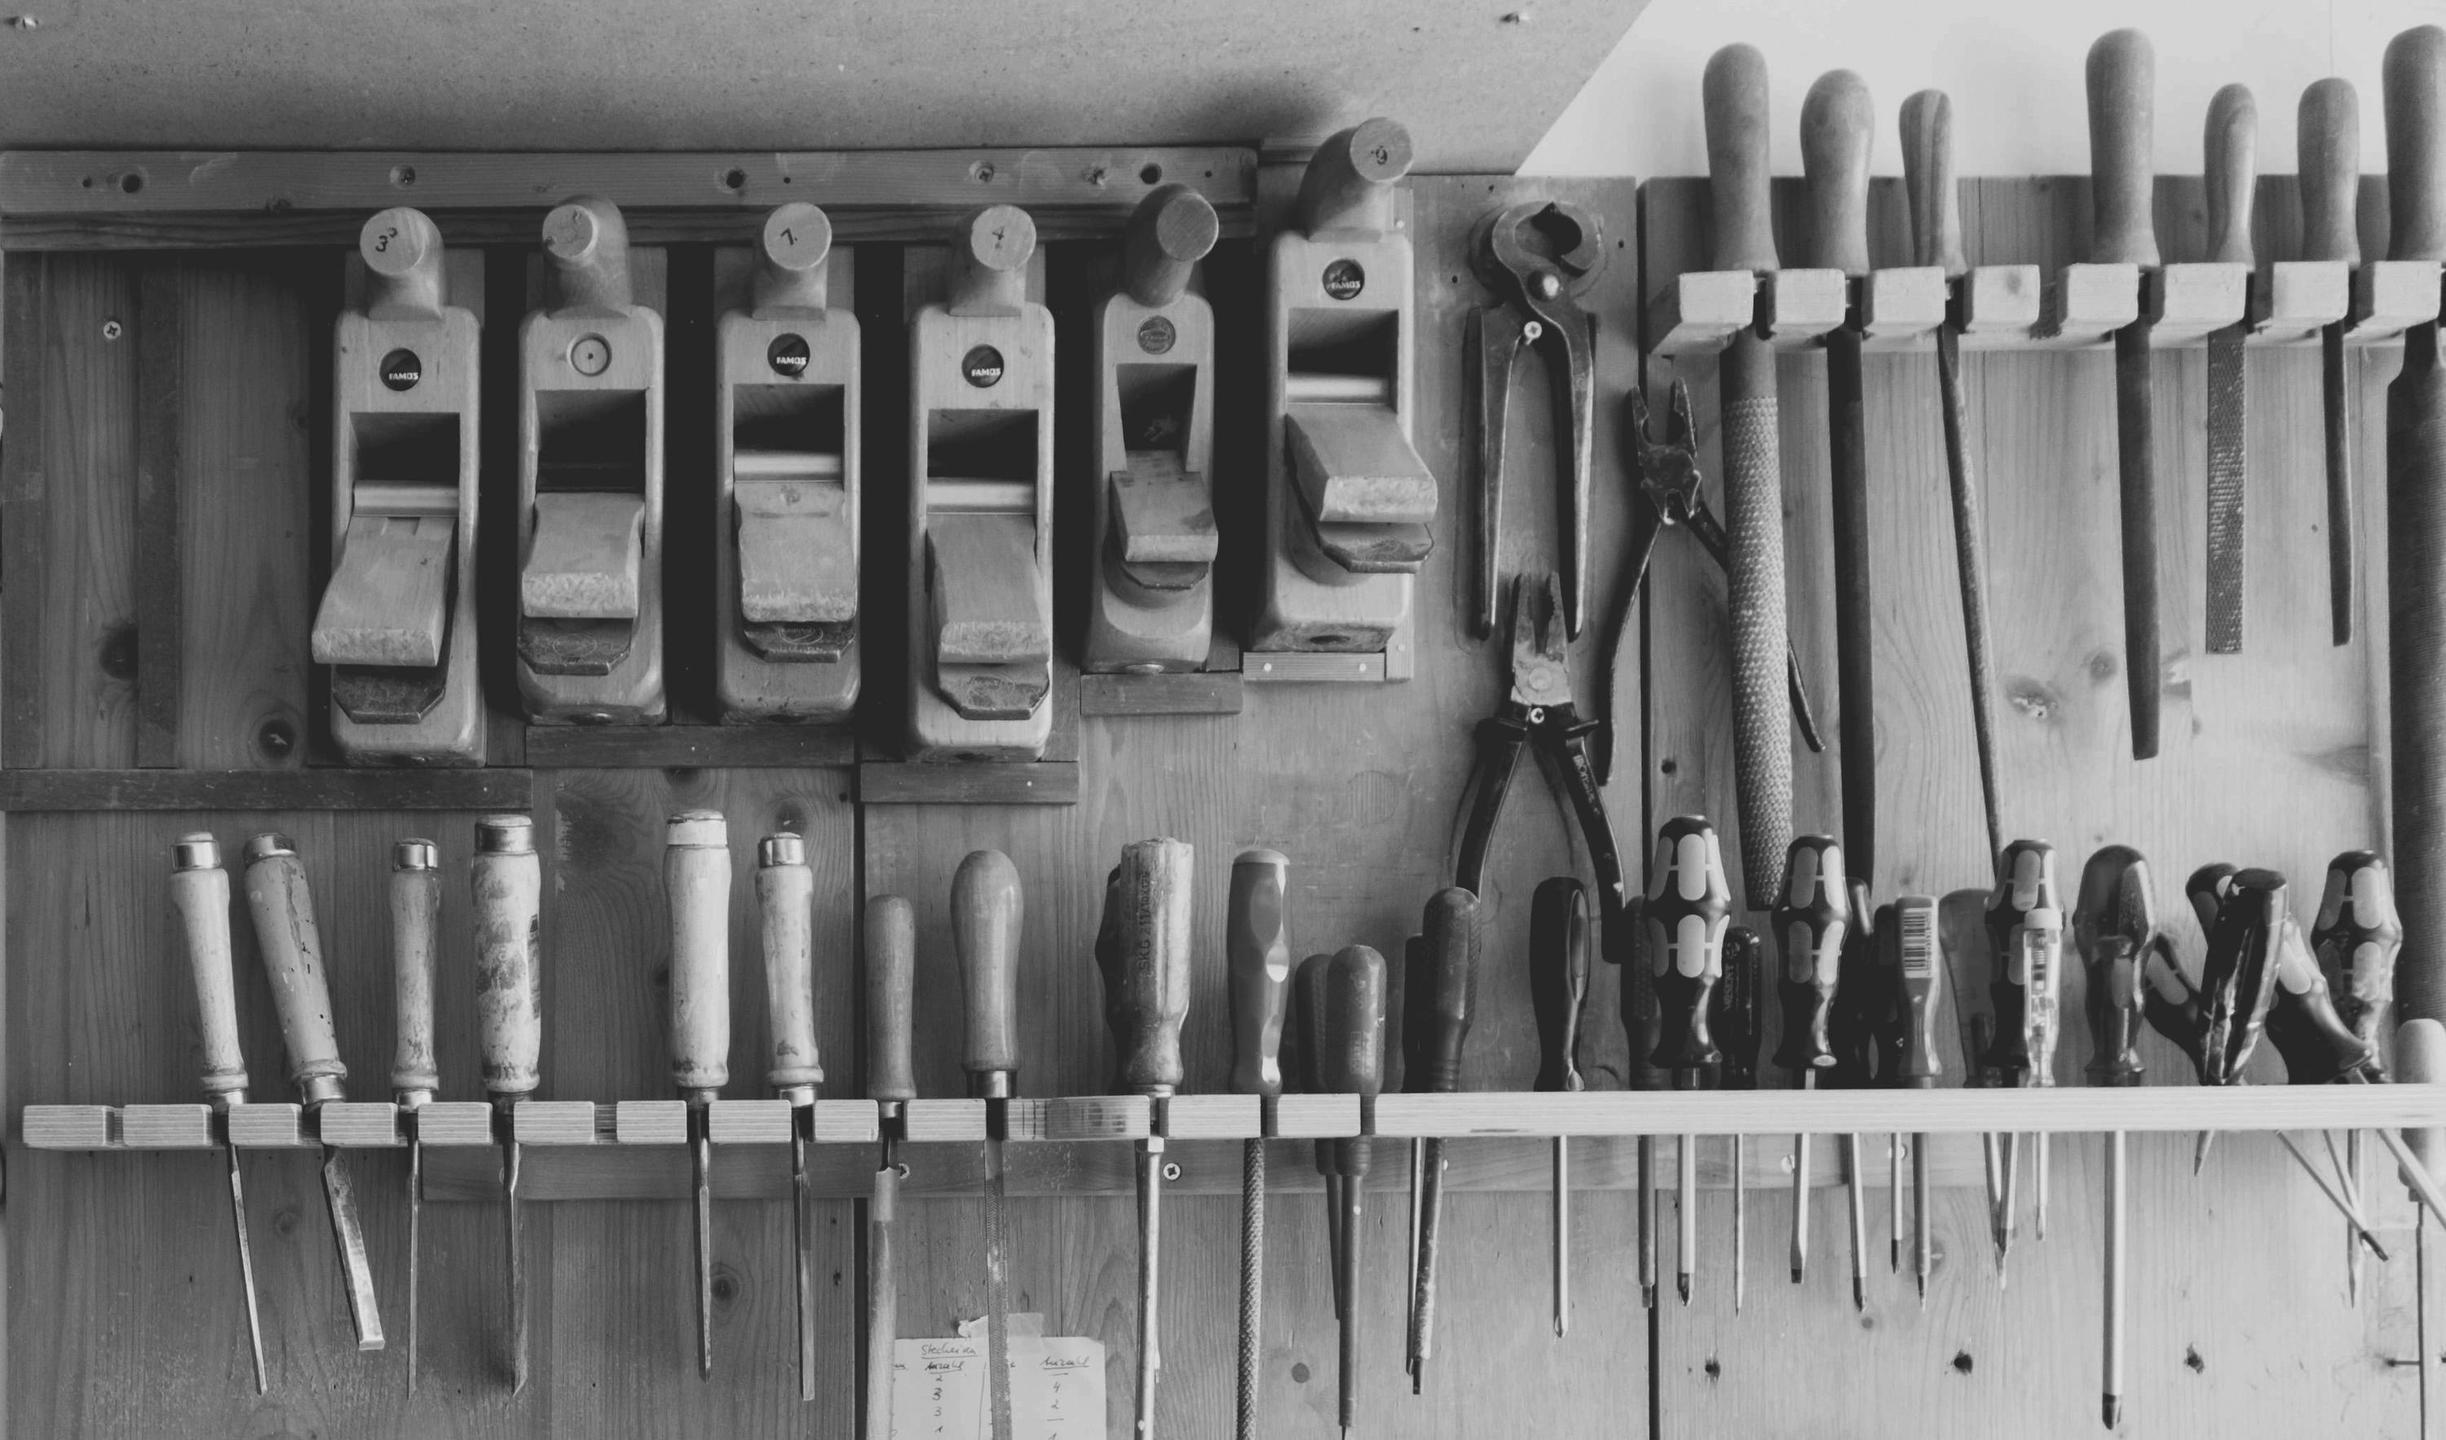 black and white image of woodshop hand tools